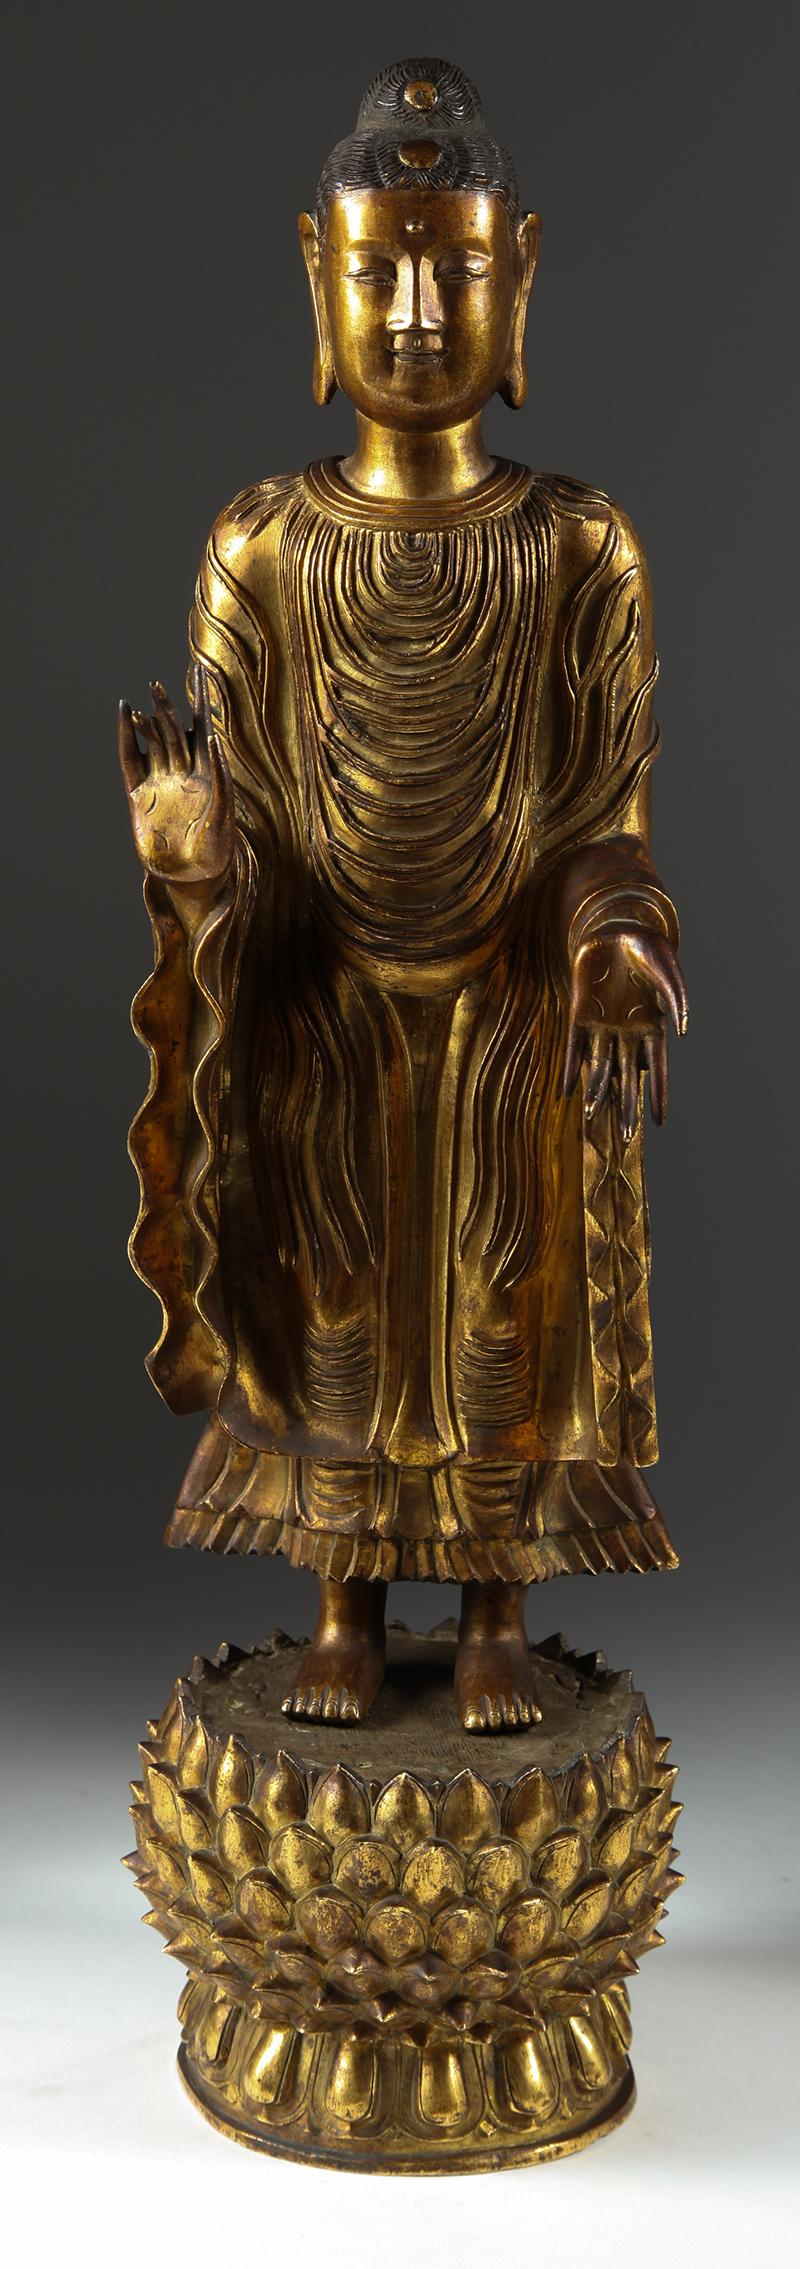 Chinese Auction, Chinese Gilt Bronze Standing Buddha on Lotus Base 17th 18th Century Asian ArtNew York Auction House, Houston Auction, Dallas Auction, San Antonio Auction, Chinese Auction, 铜鎏佛像, 站佛, 莲花宝座, 古董拍卖, 海外捡漏, 亚洲艺术